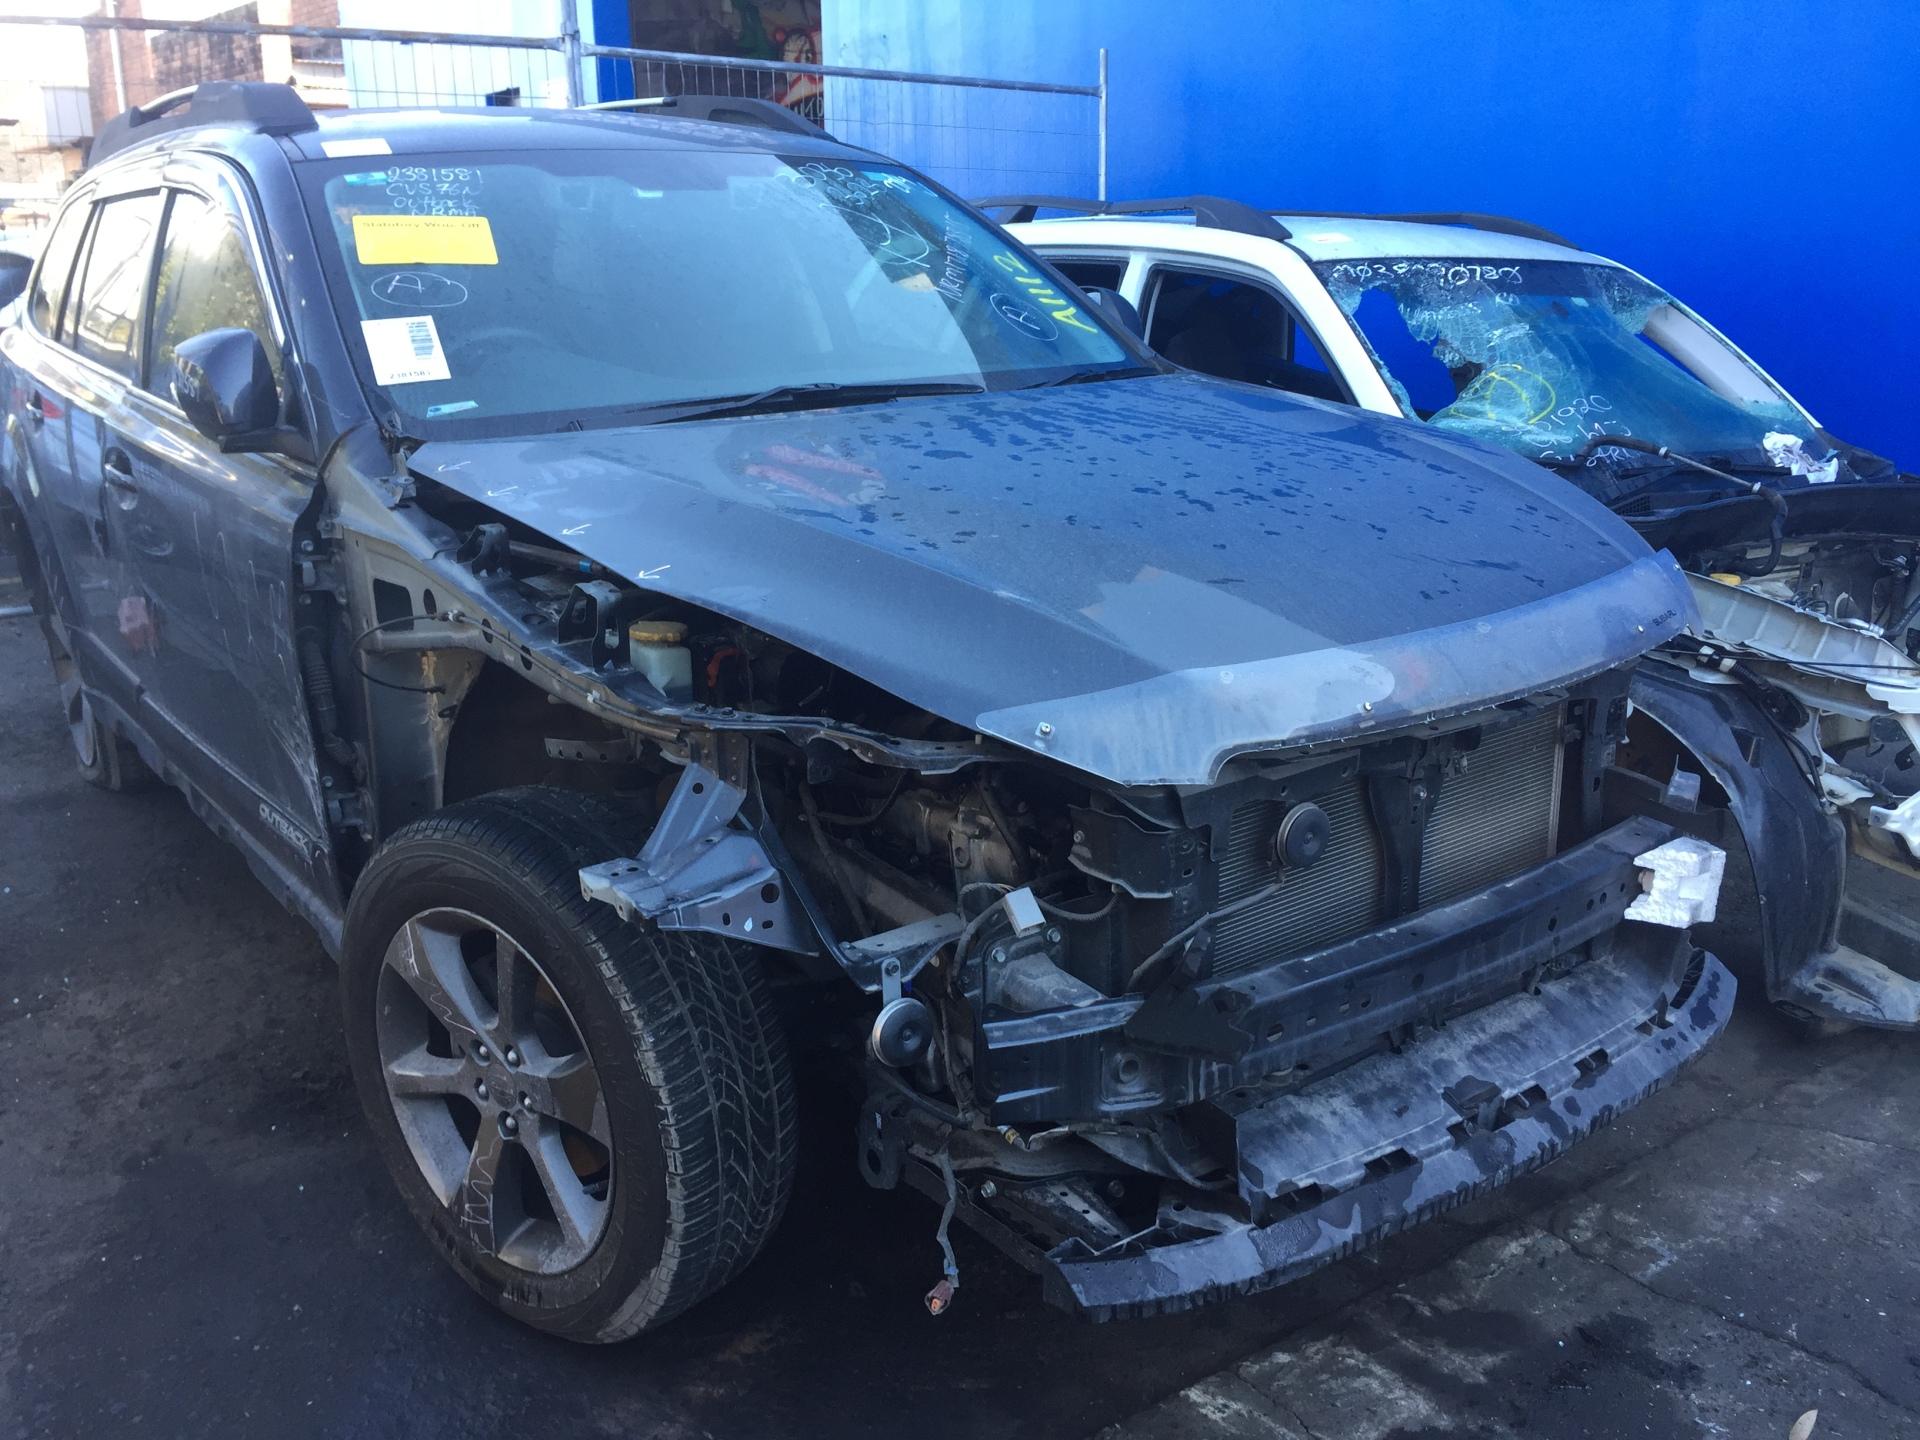 Subaru Wrecking Outback 2013 Gen 5 Petrol FB25 Spare Parts